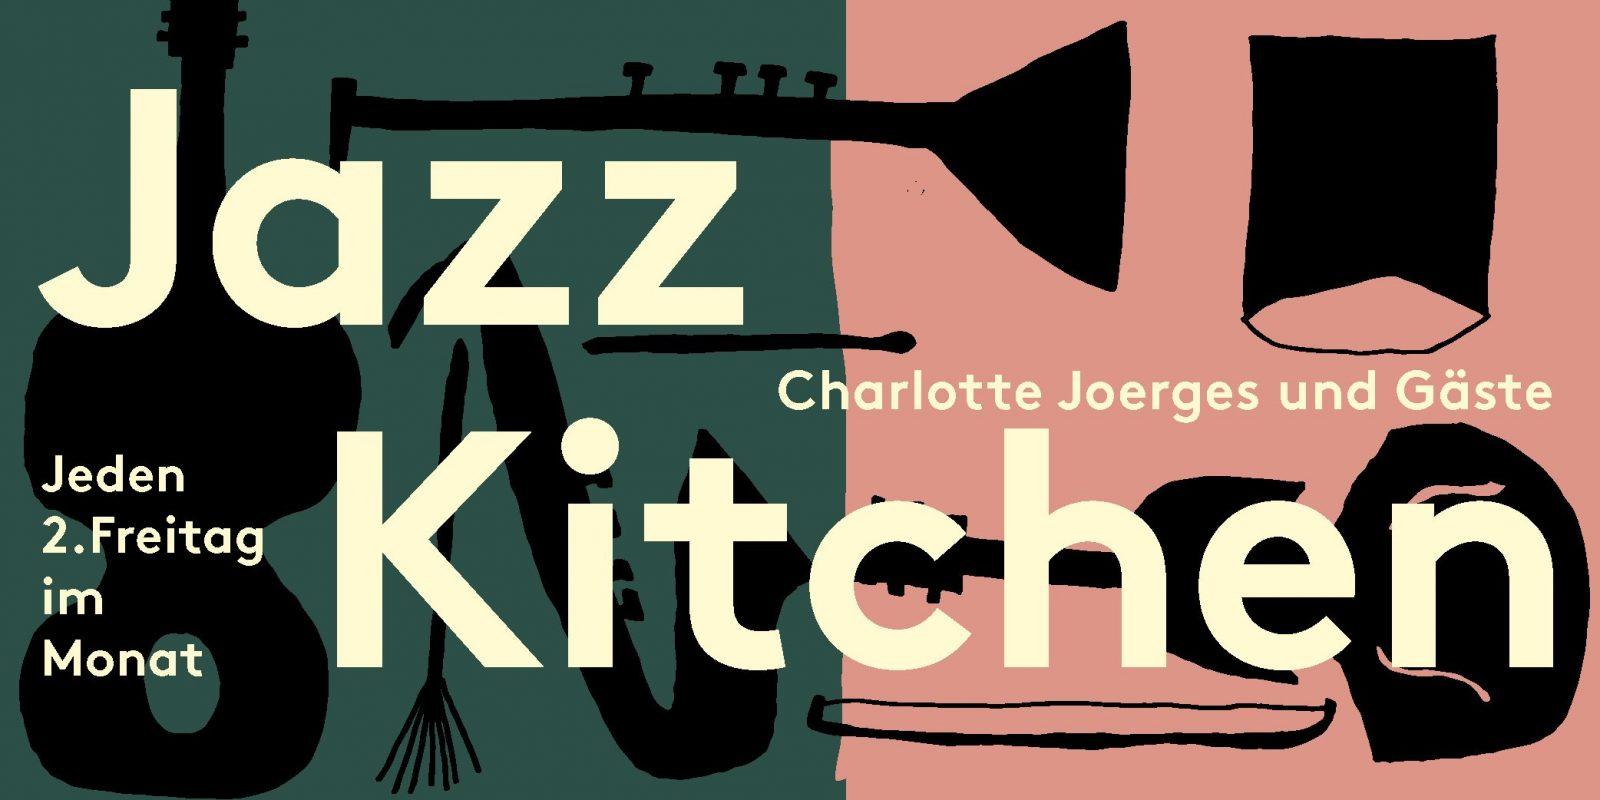 Jazz Kitchen Mastul - Charlotte Joerges, Isi Bass, Flo Müller